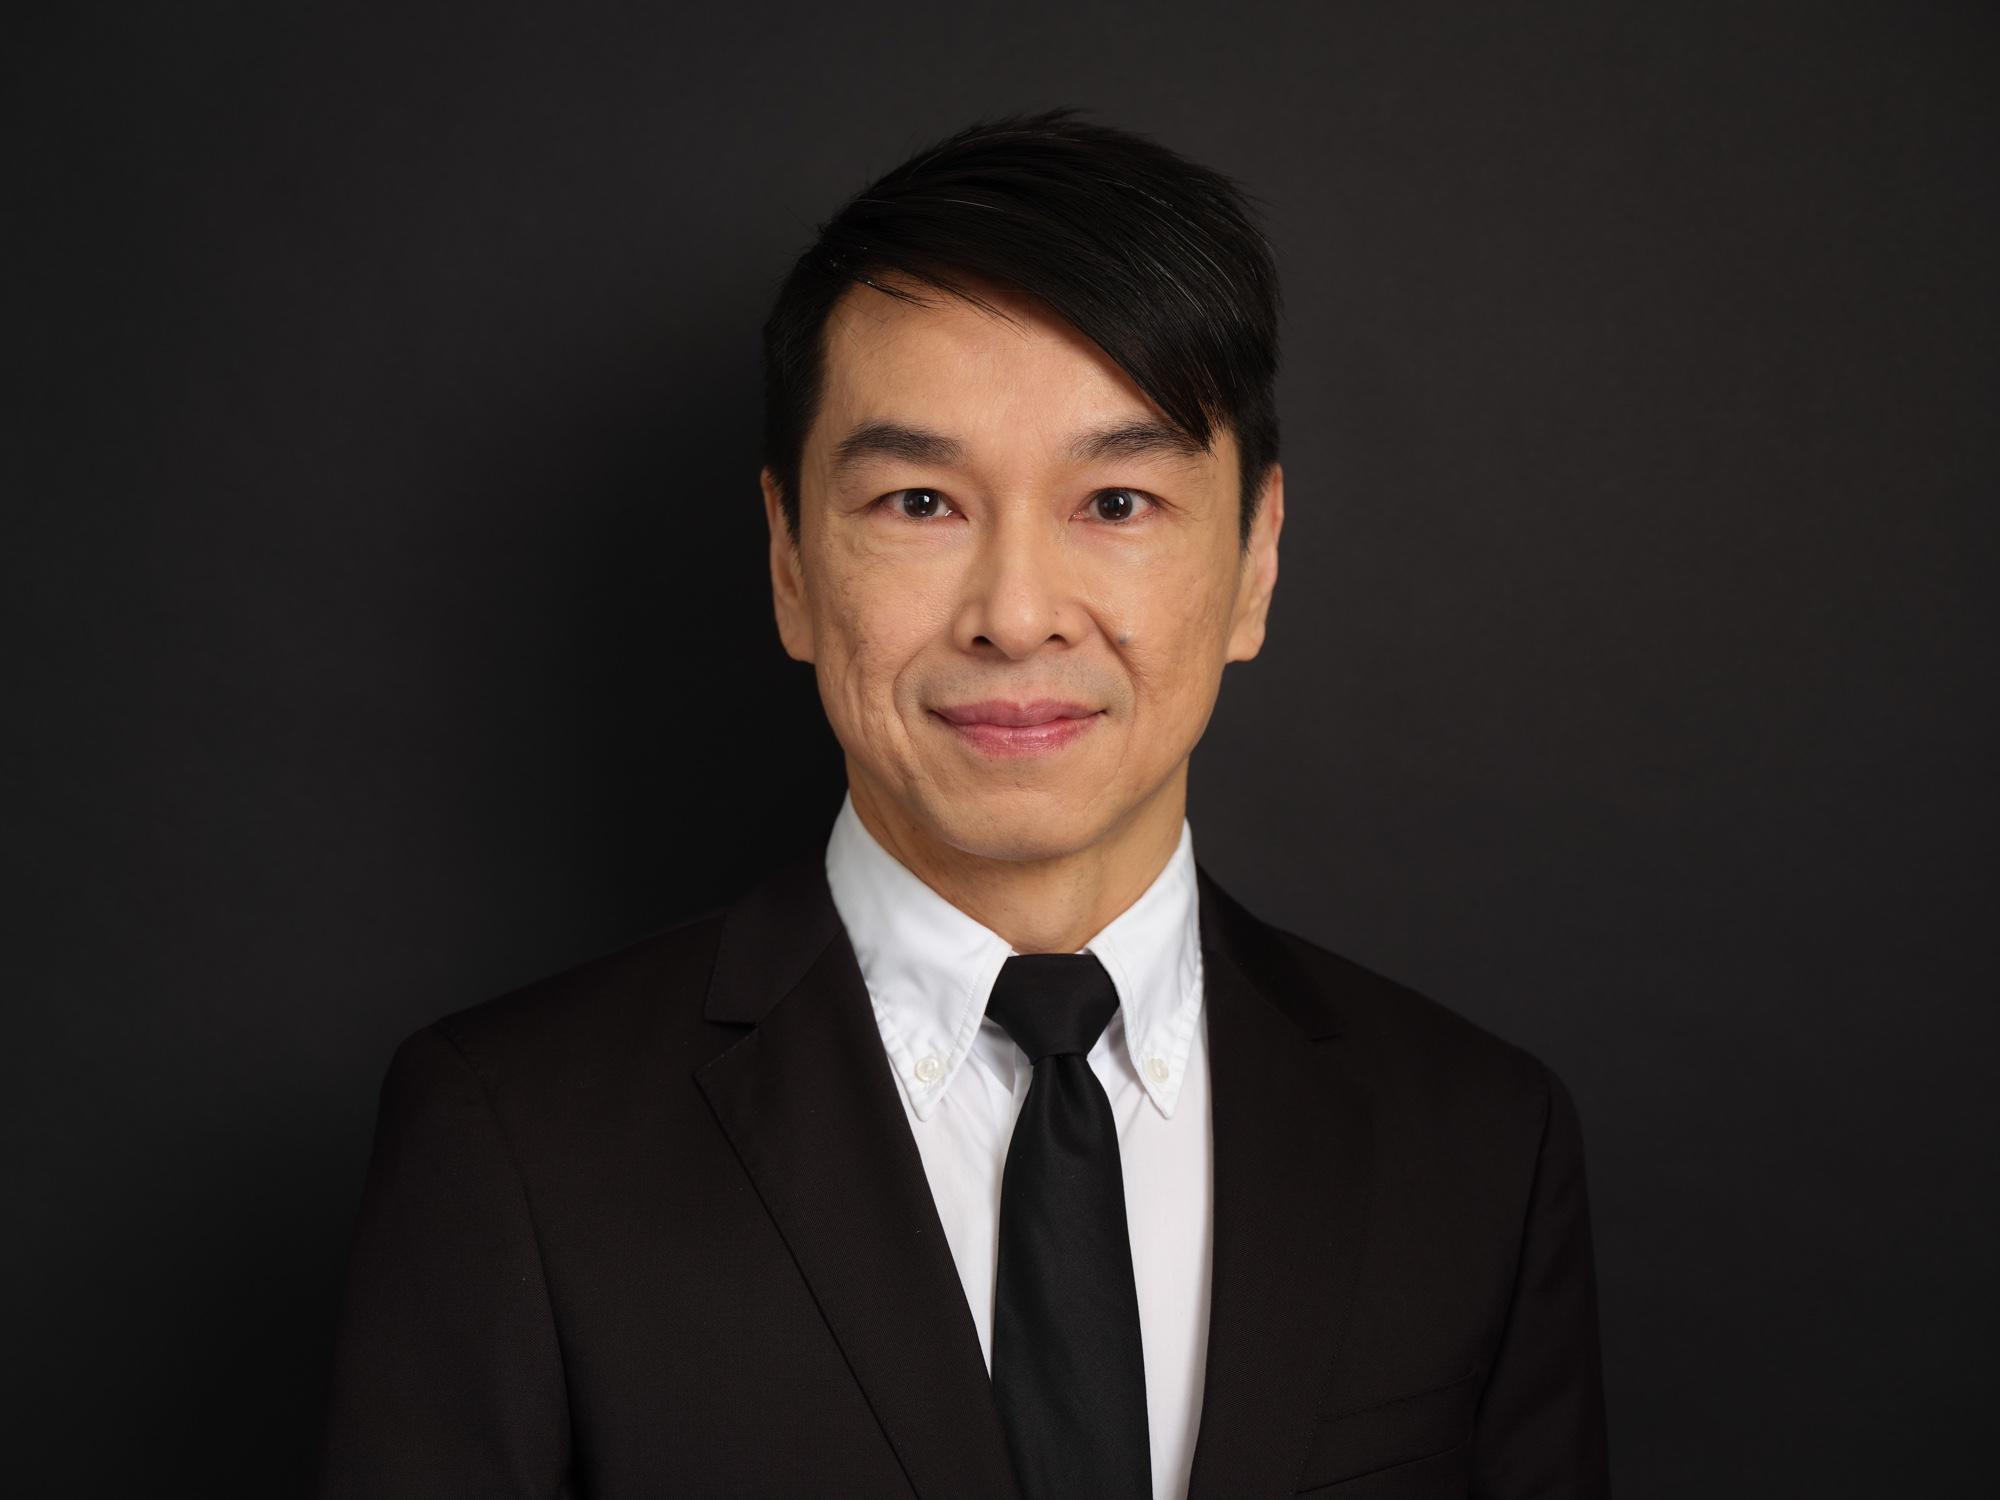 Headshot Photography Portrait Photographer Singapore Coco Creative Studio 6-3